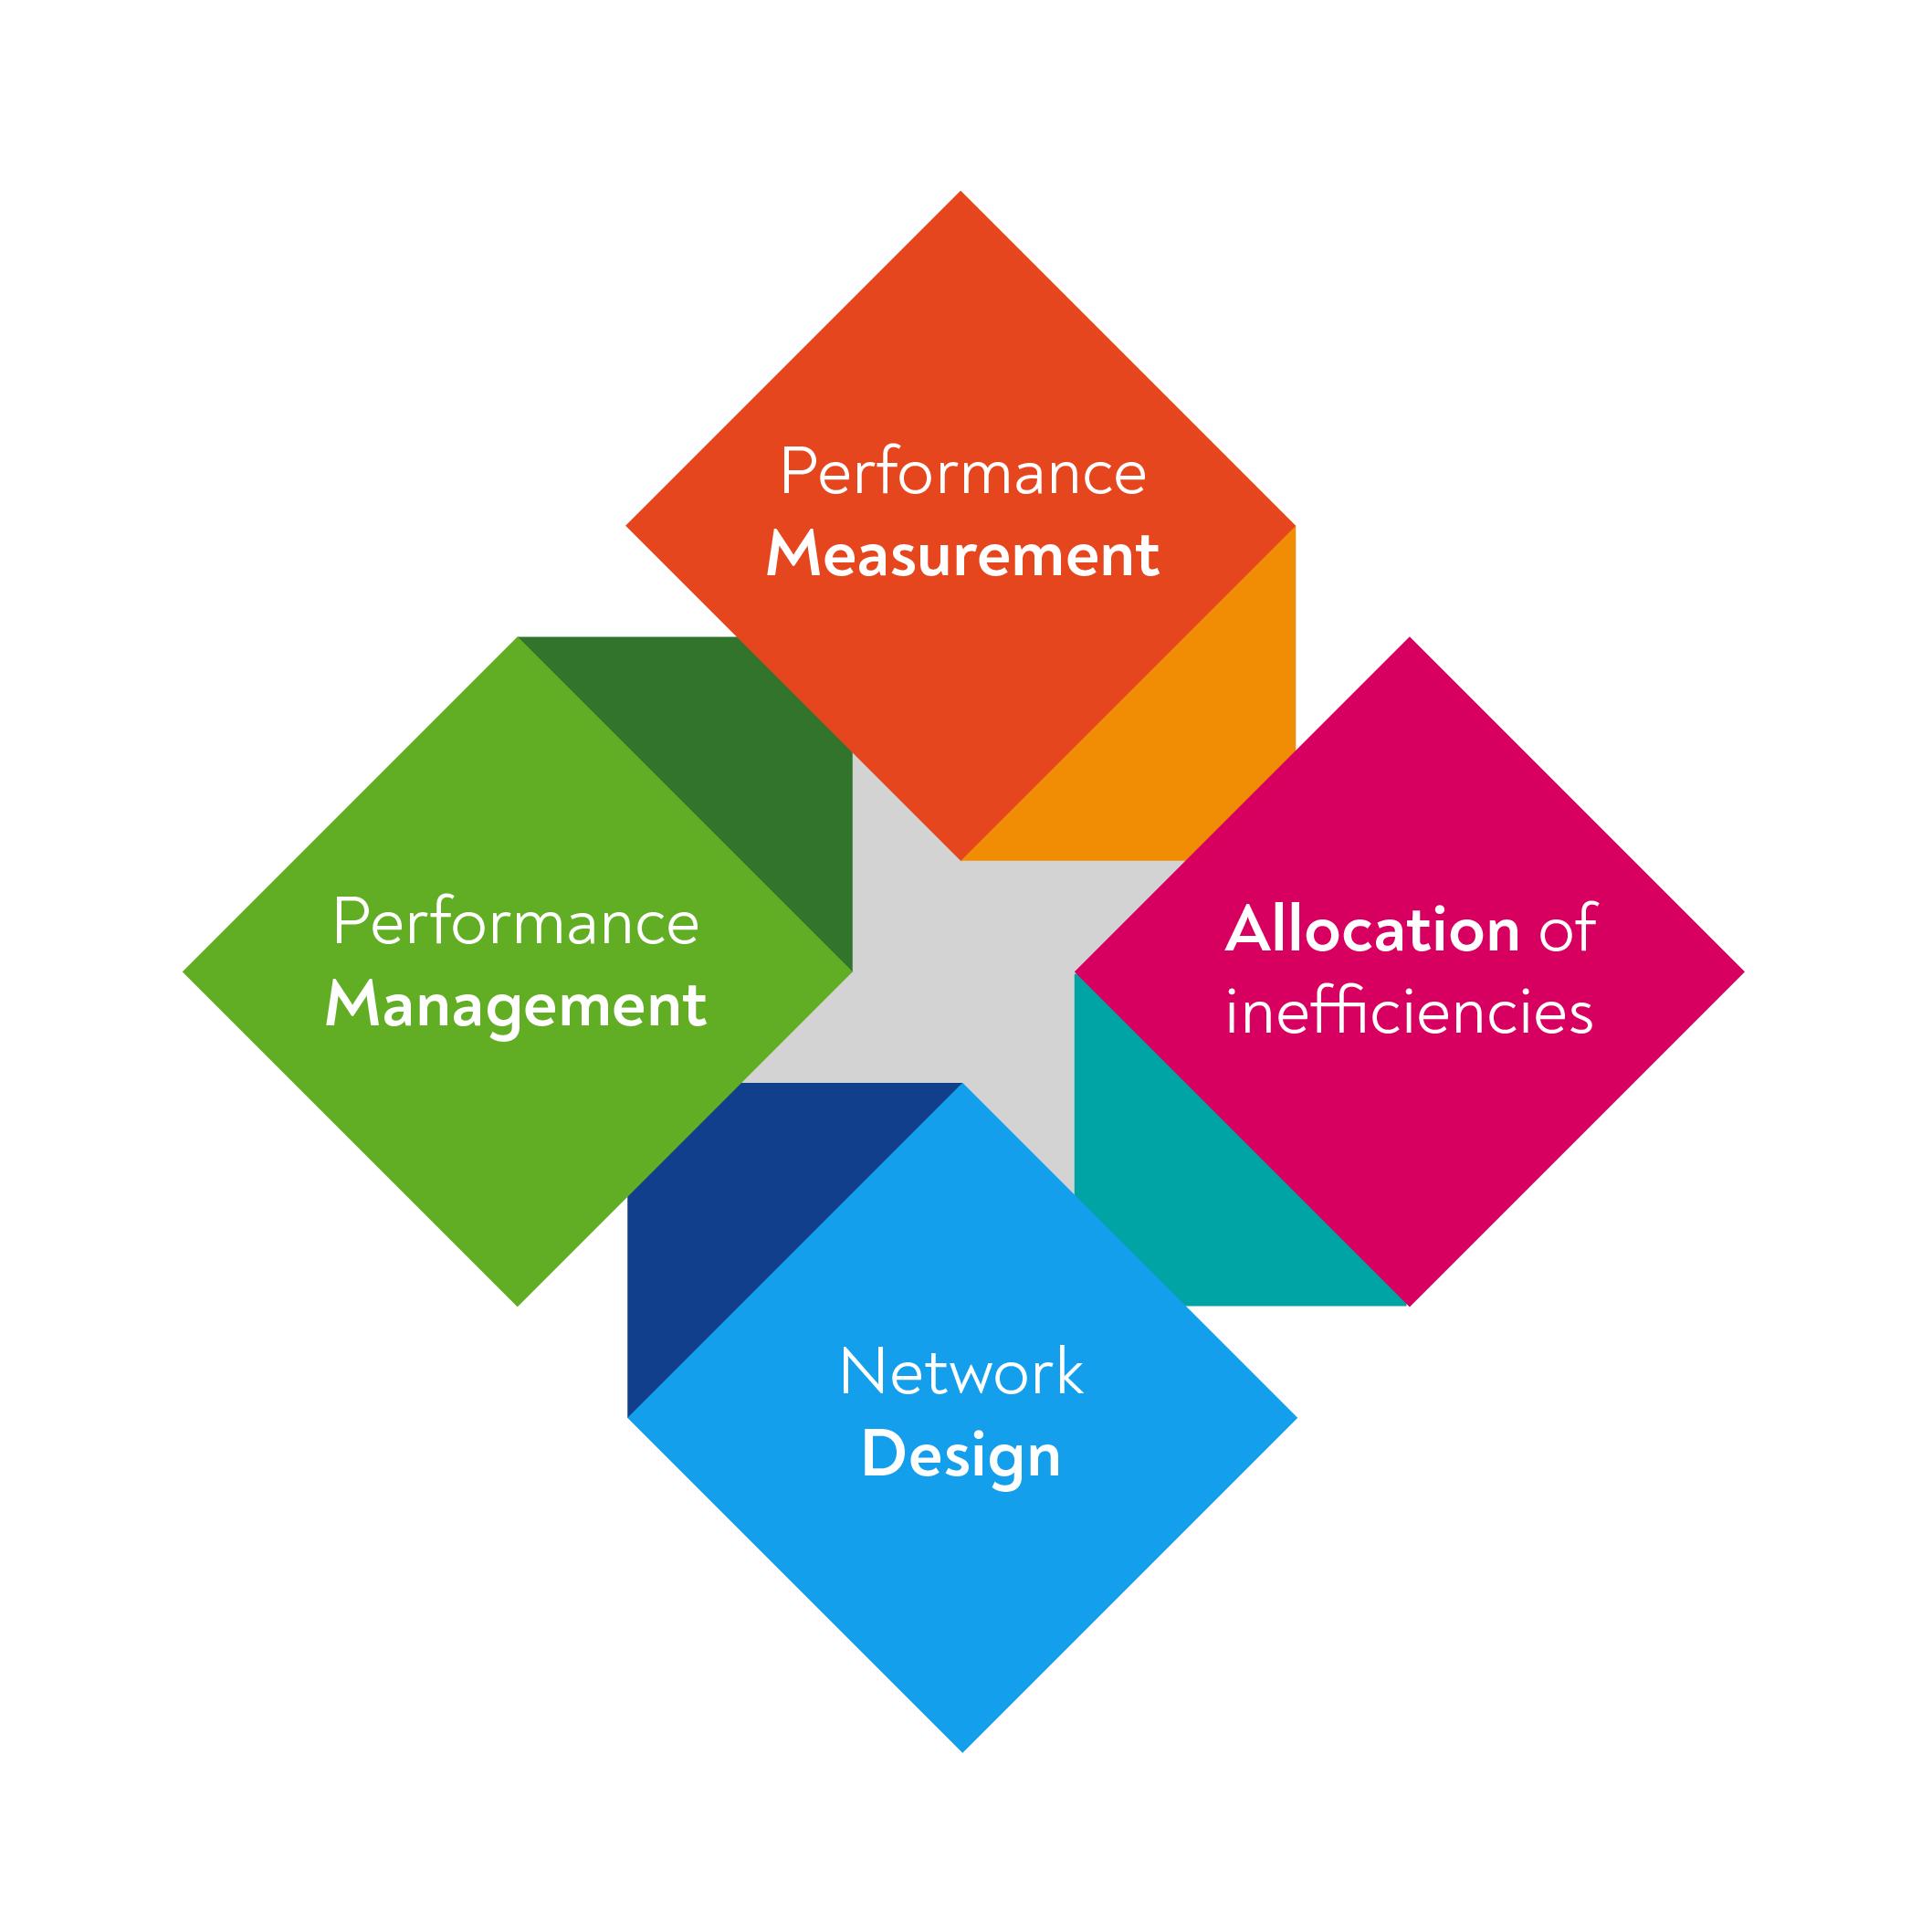 ↪ Performance Management → Performance Measurement → Allocation of inefficiencies → Network Design ↩